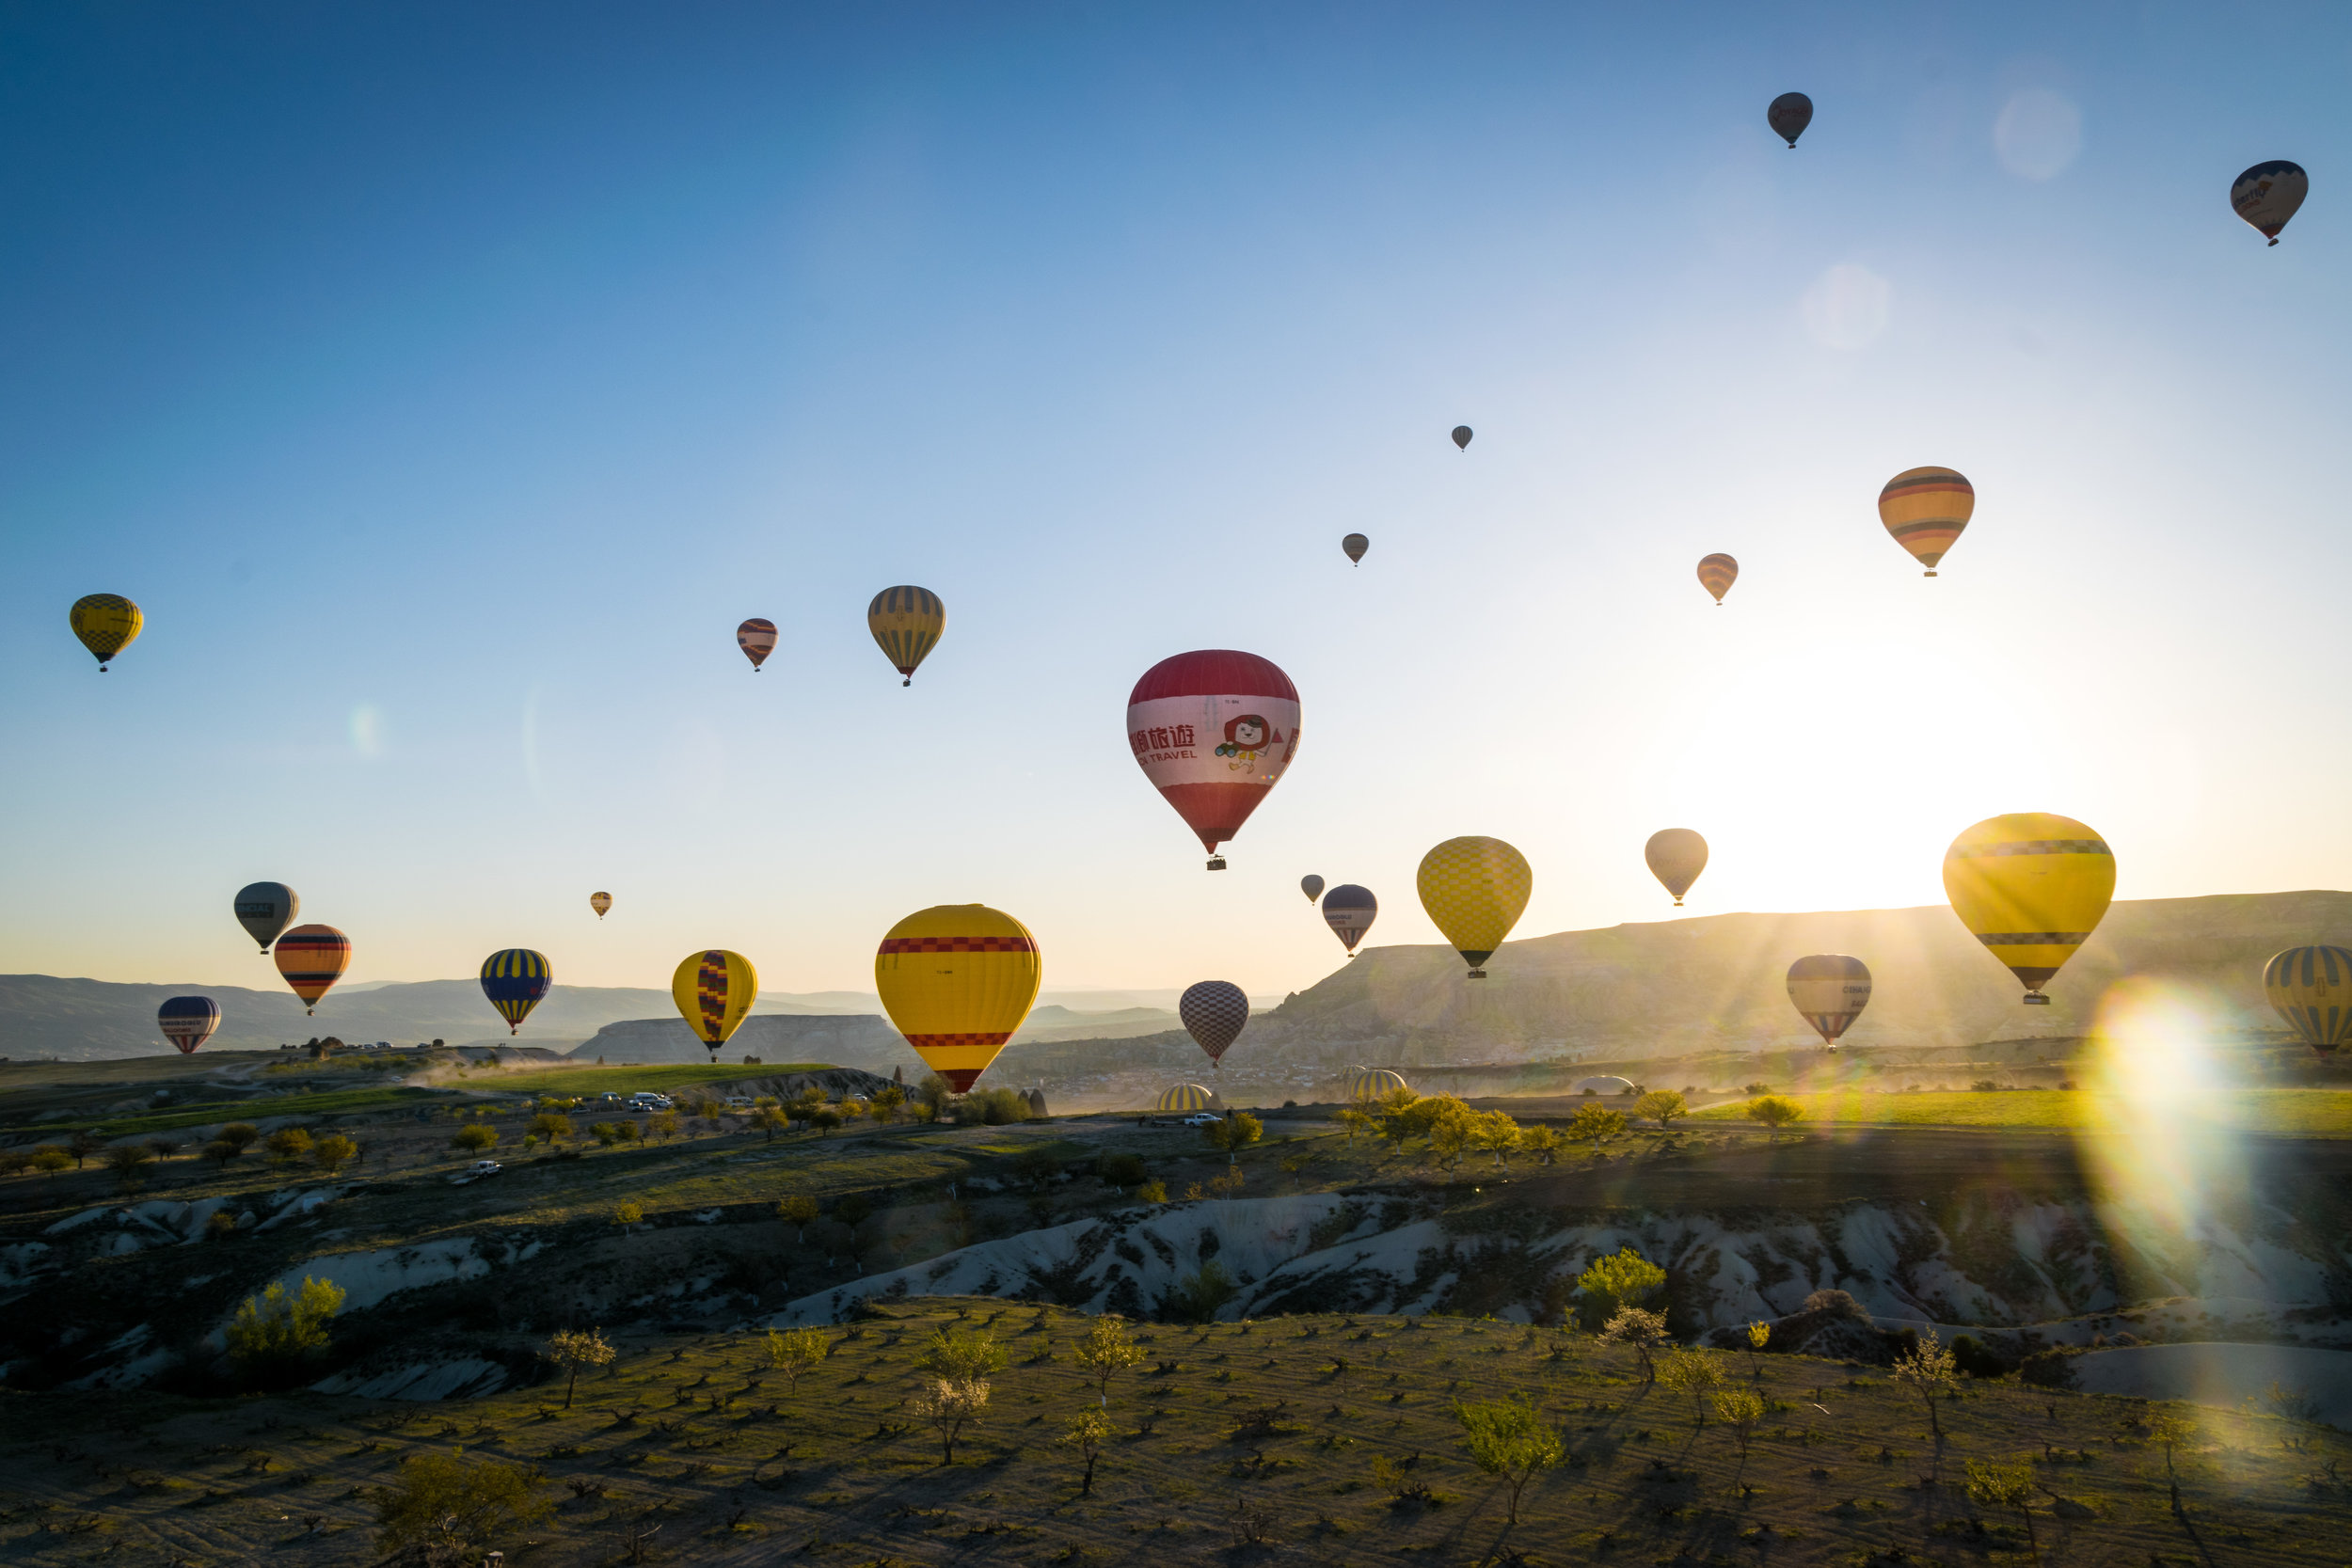 Turkey_Cappadocia_balloon+ride-7.jpg